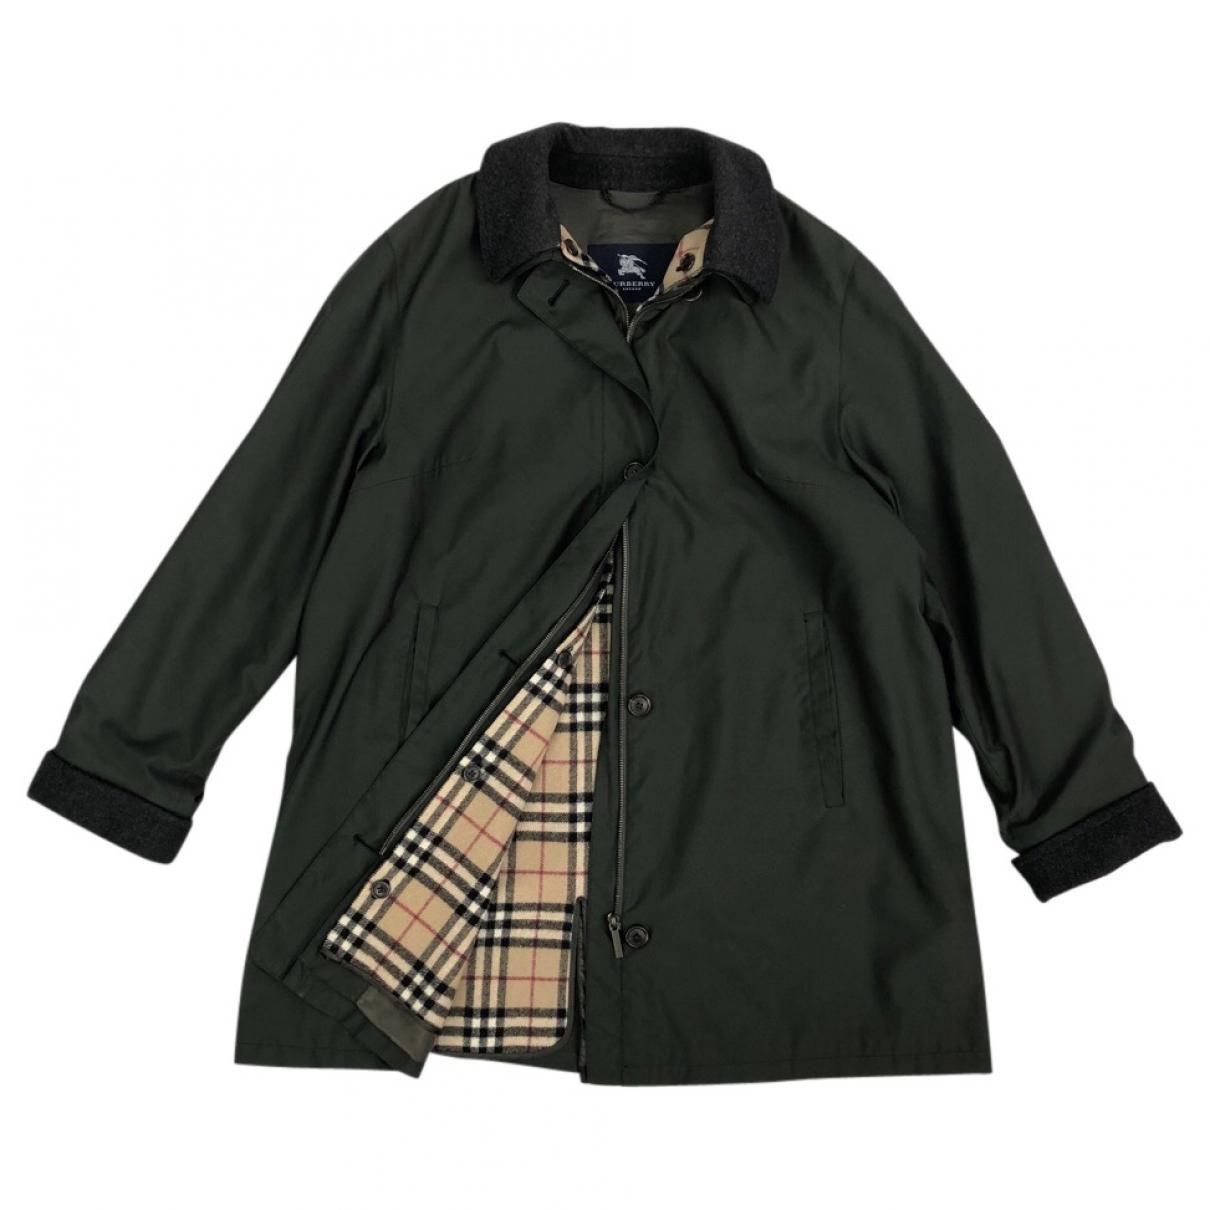 301a1106b4d1 Burberry Coat in Green - Lyst